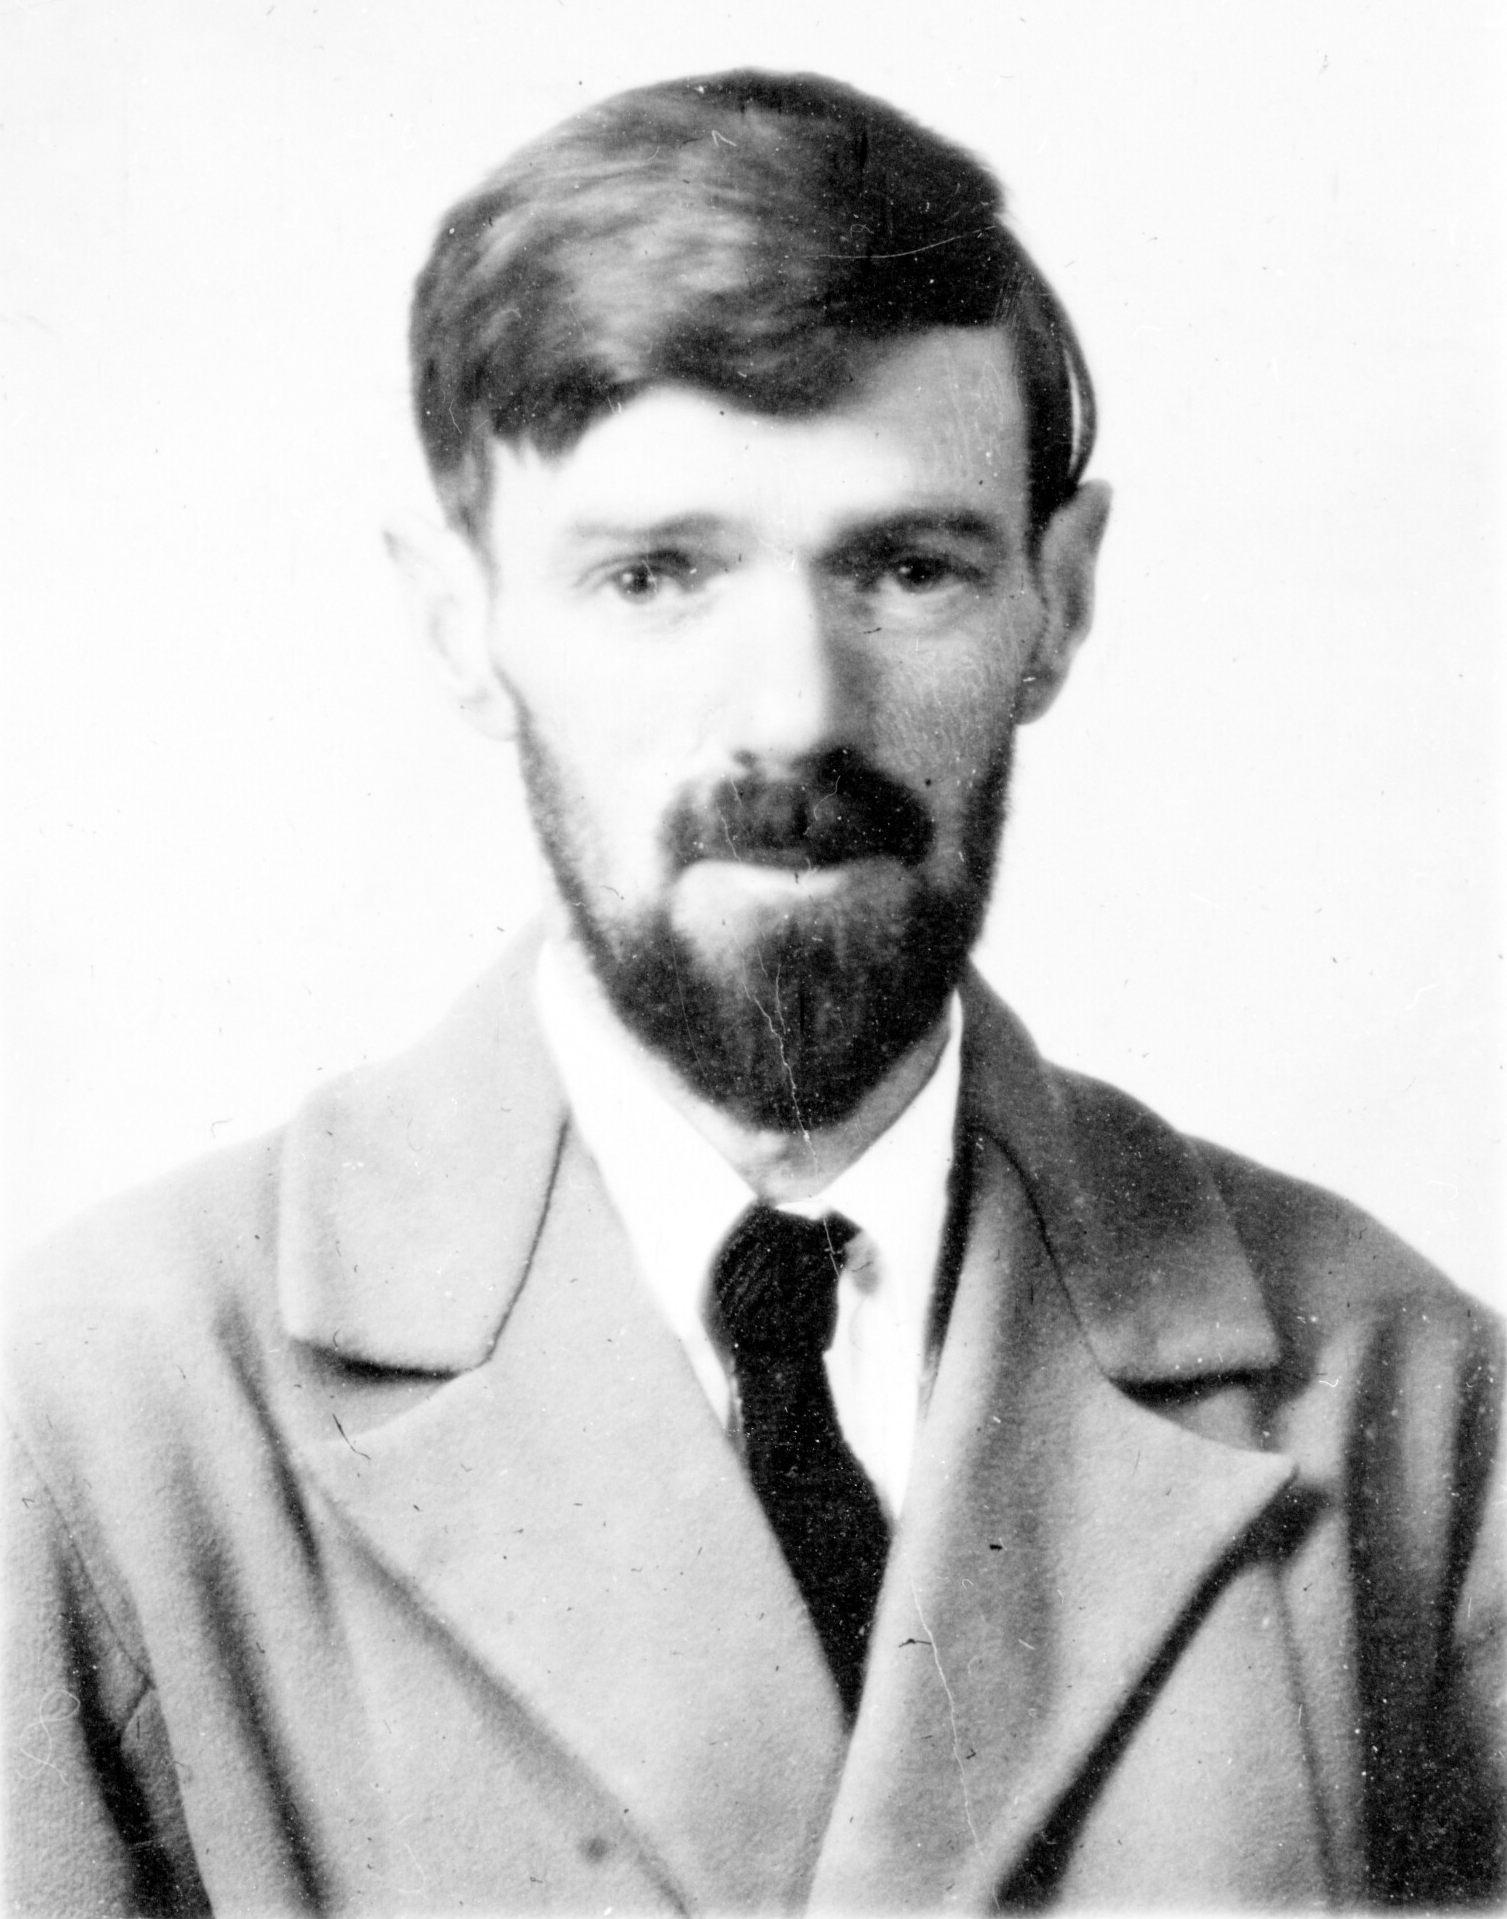 D H Lawrence Passport Photograph